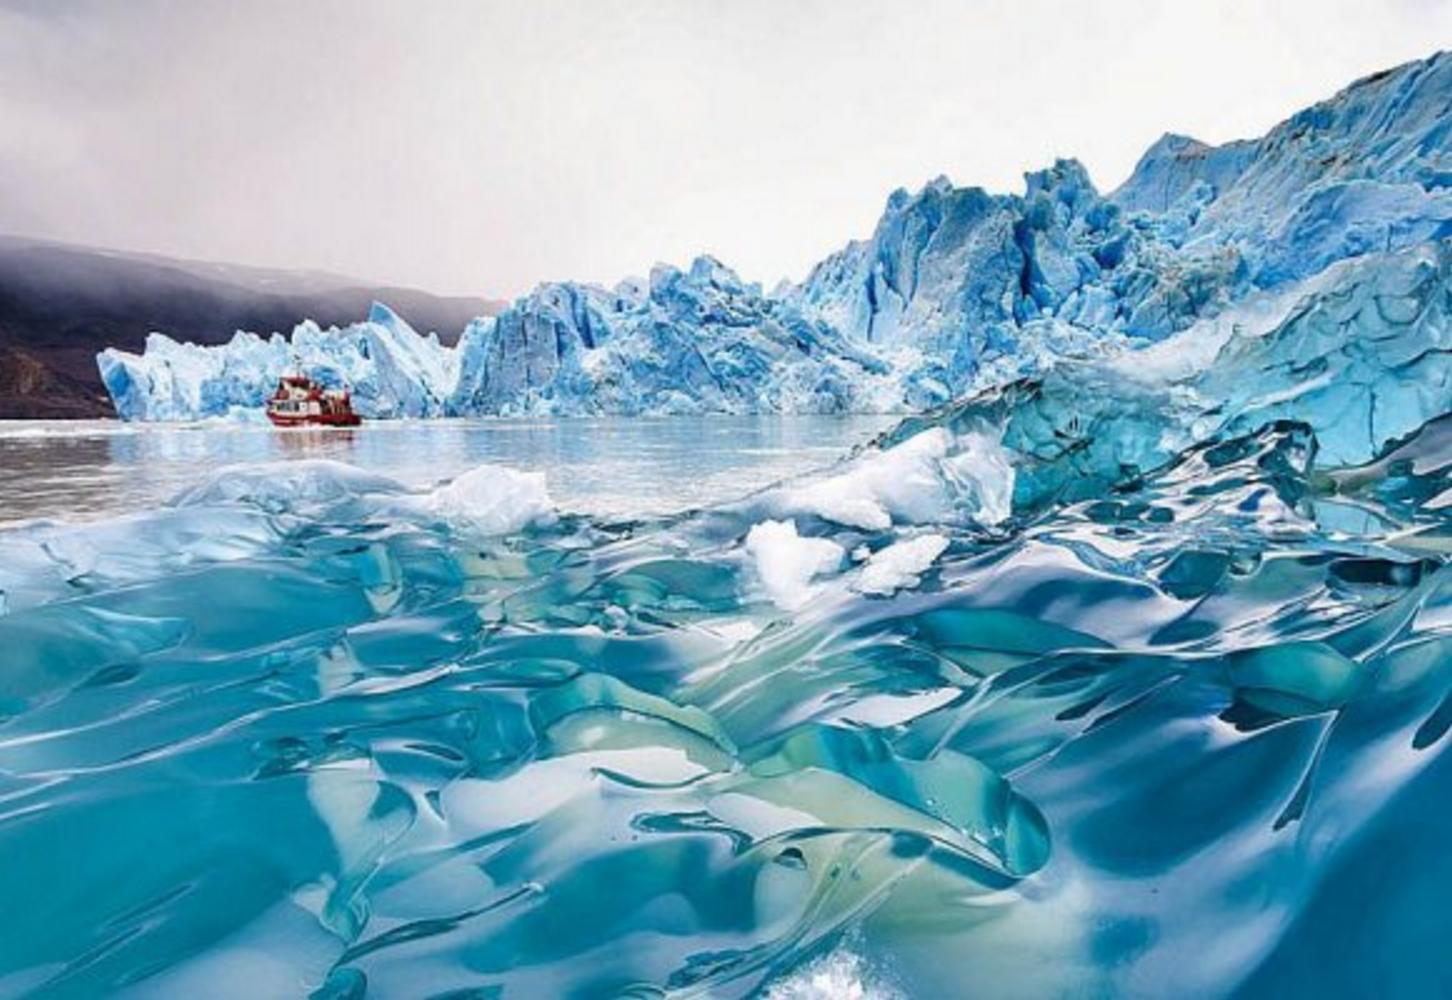 Lake Grey, Grey Glacier, Patagonia, Chile